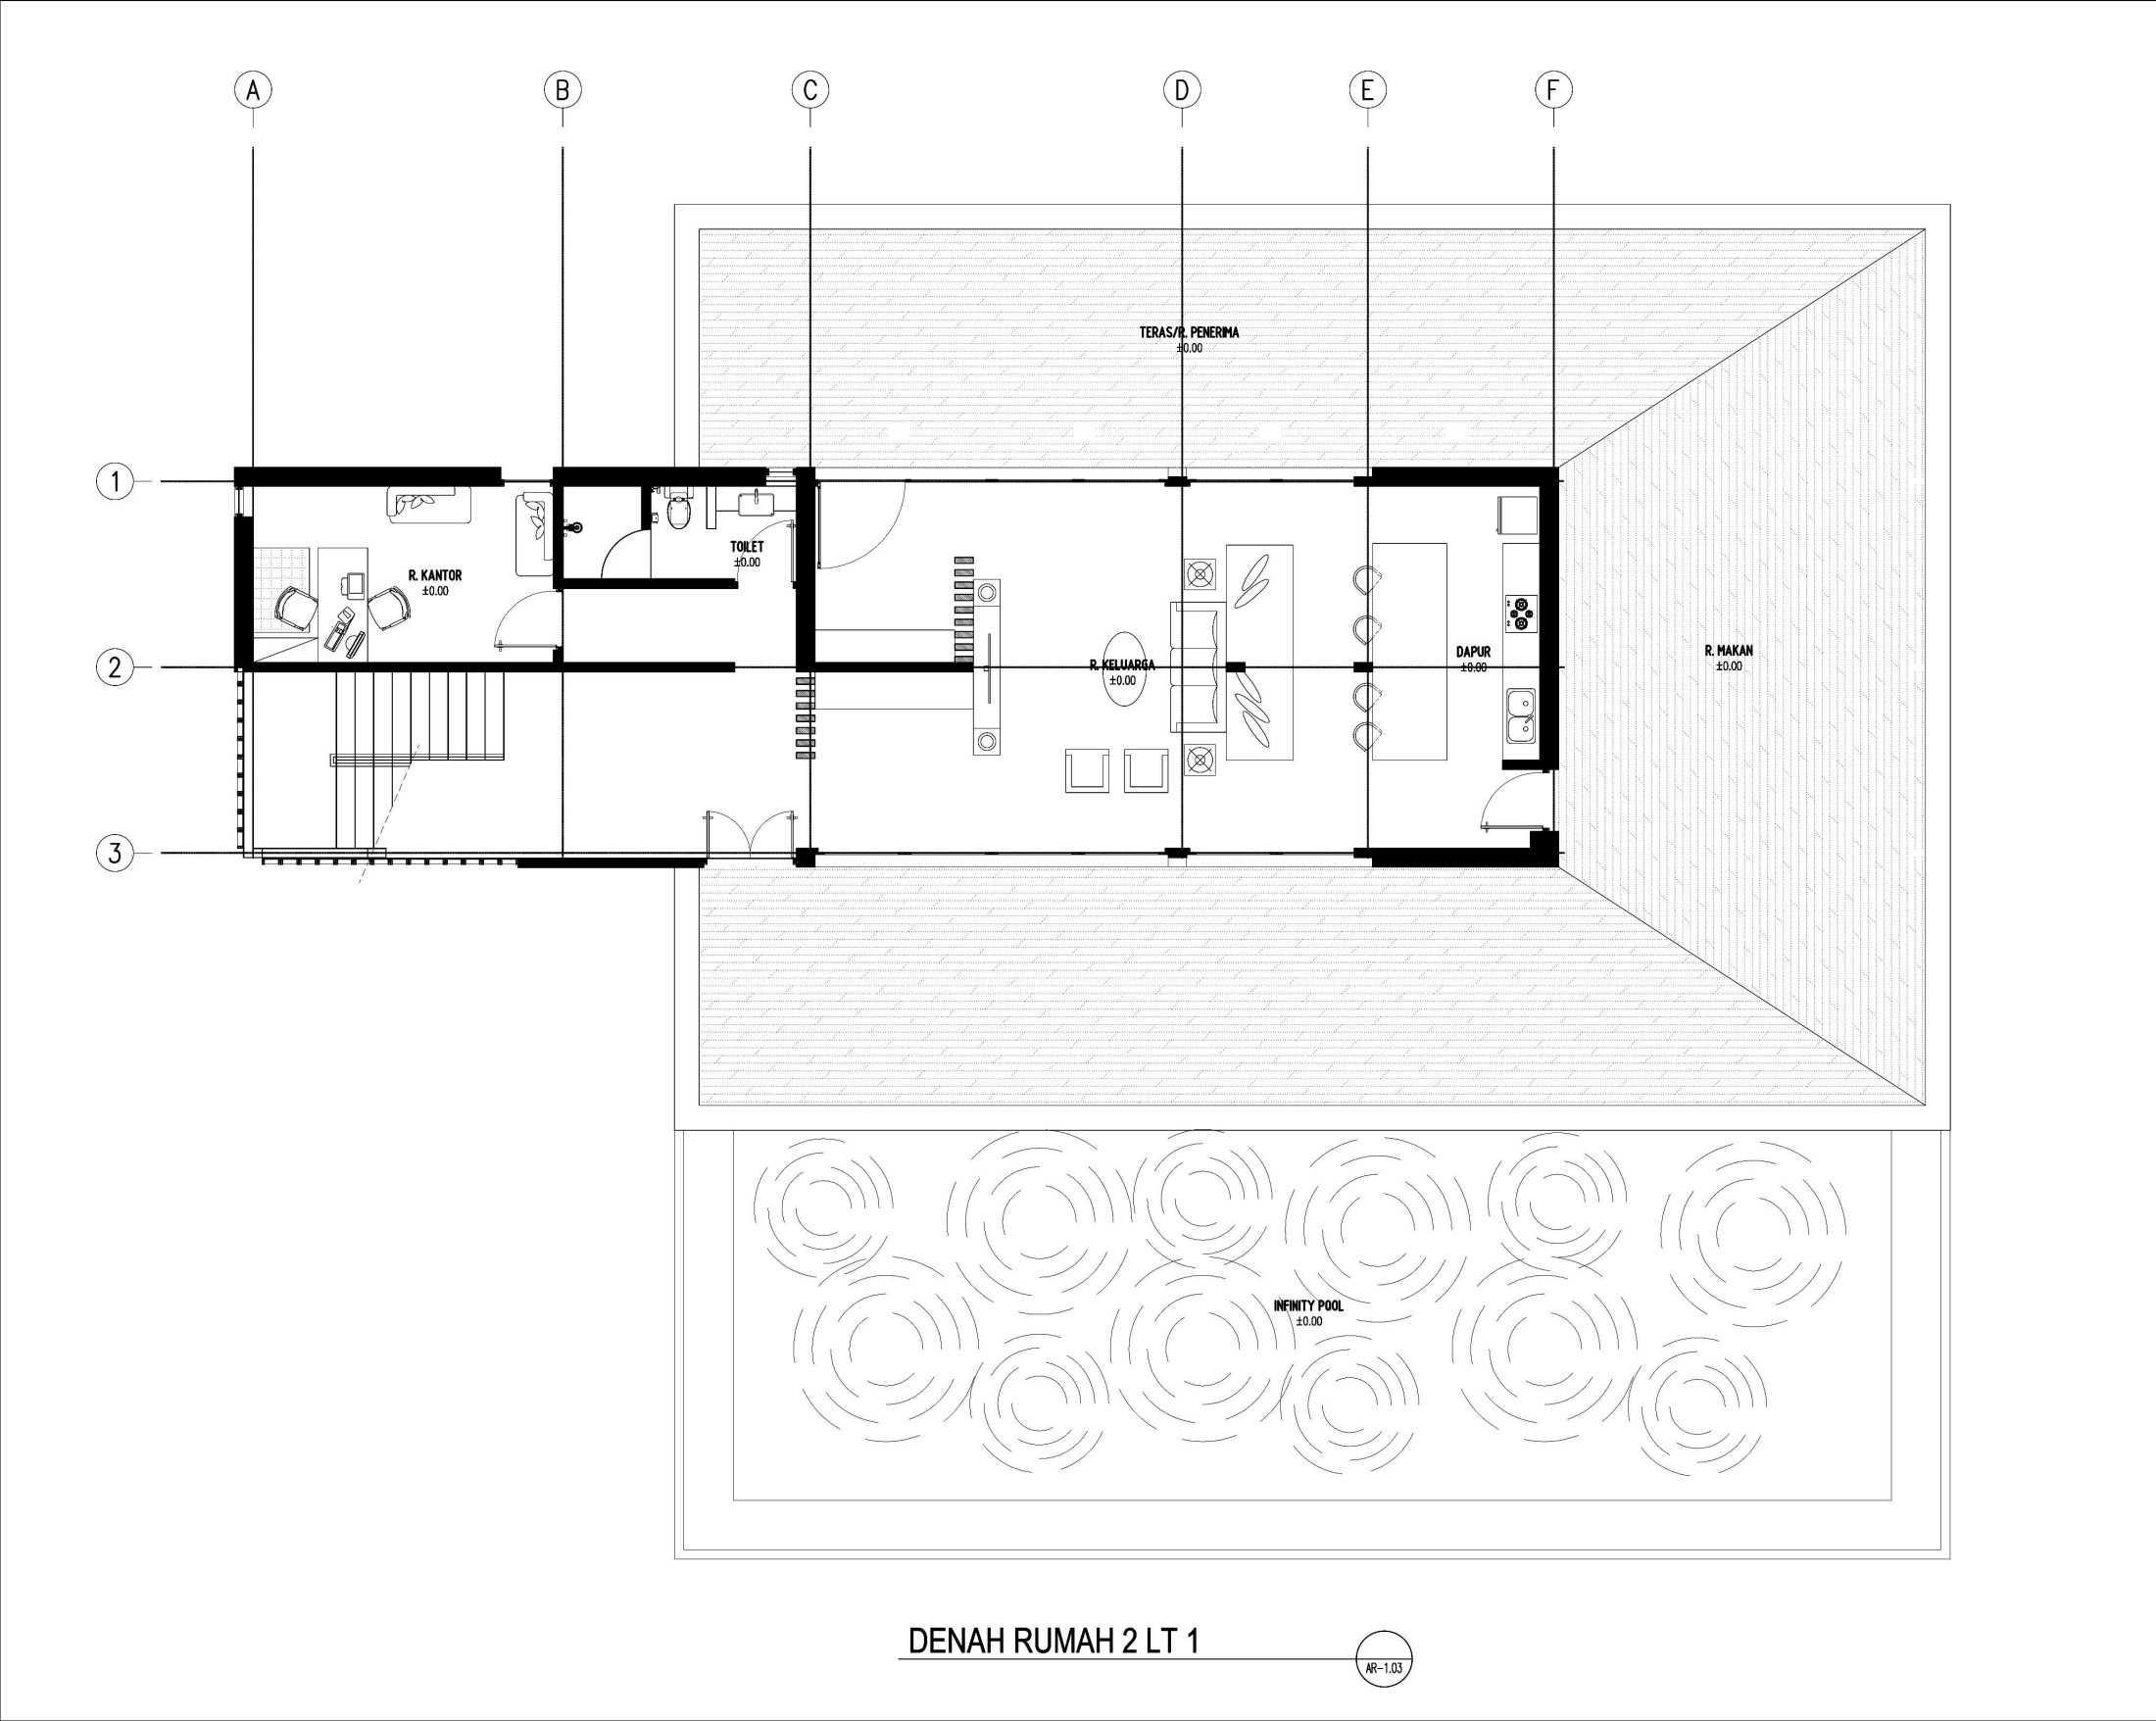 Gubah Ruang Ms House Kabupaten Garut, Jawa Barat, Indonesia Kabupaten Garut, Jawa Barat, Indonesia Gubah-Ruang-Studio-Ms-House  59338